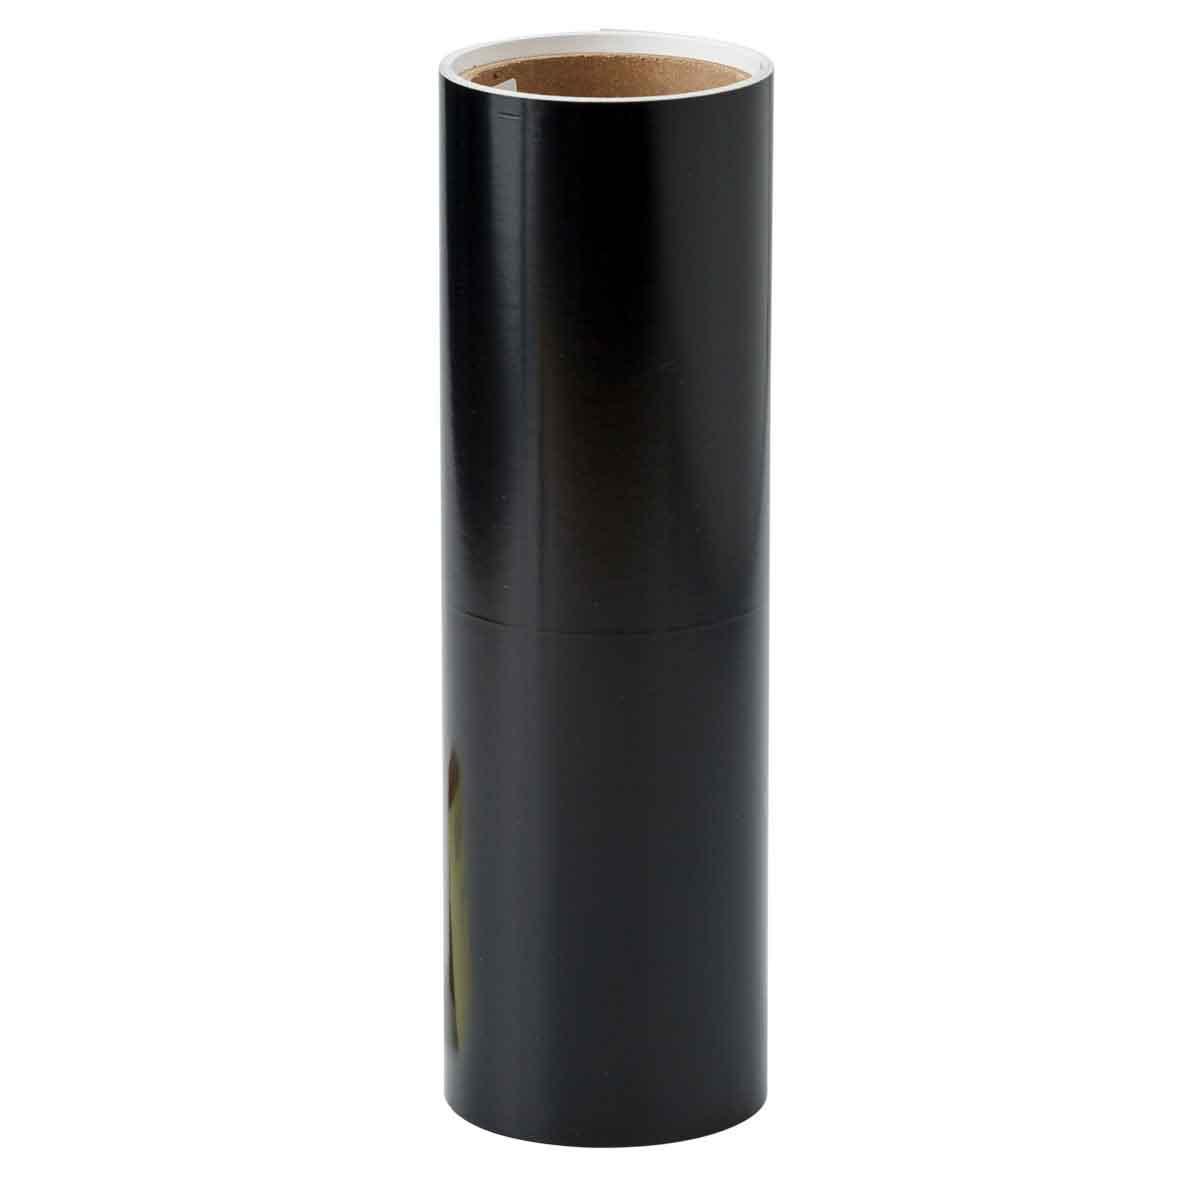 Brady® 121121 Non-Reflective Shadow Board Tool Tape, 12 ft L x 12 in W, Black, B-7569 Vinyl Film